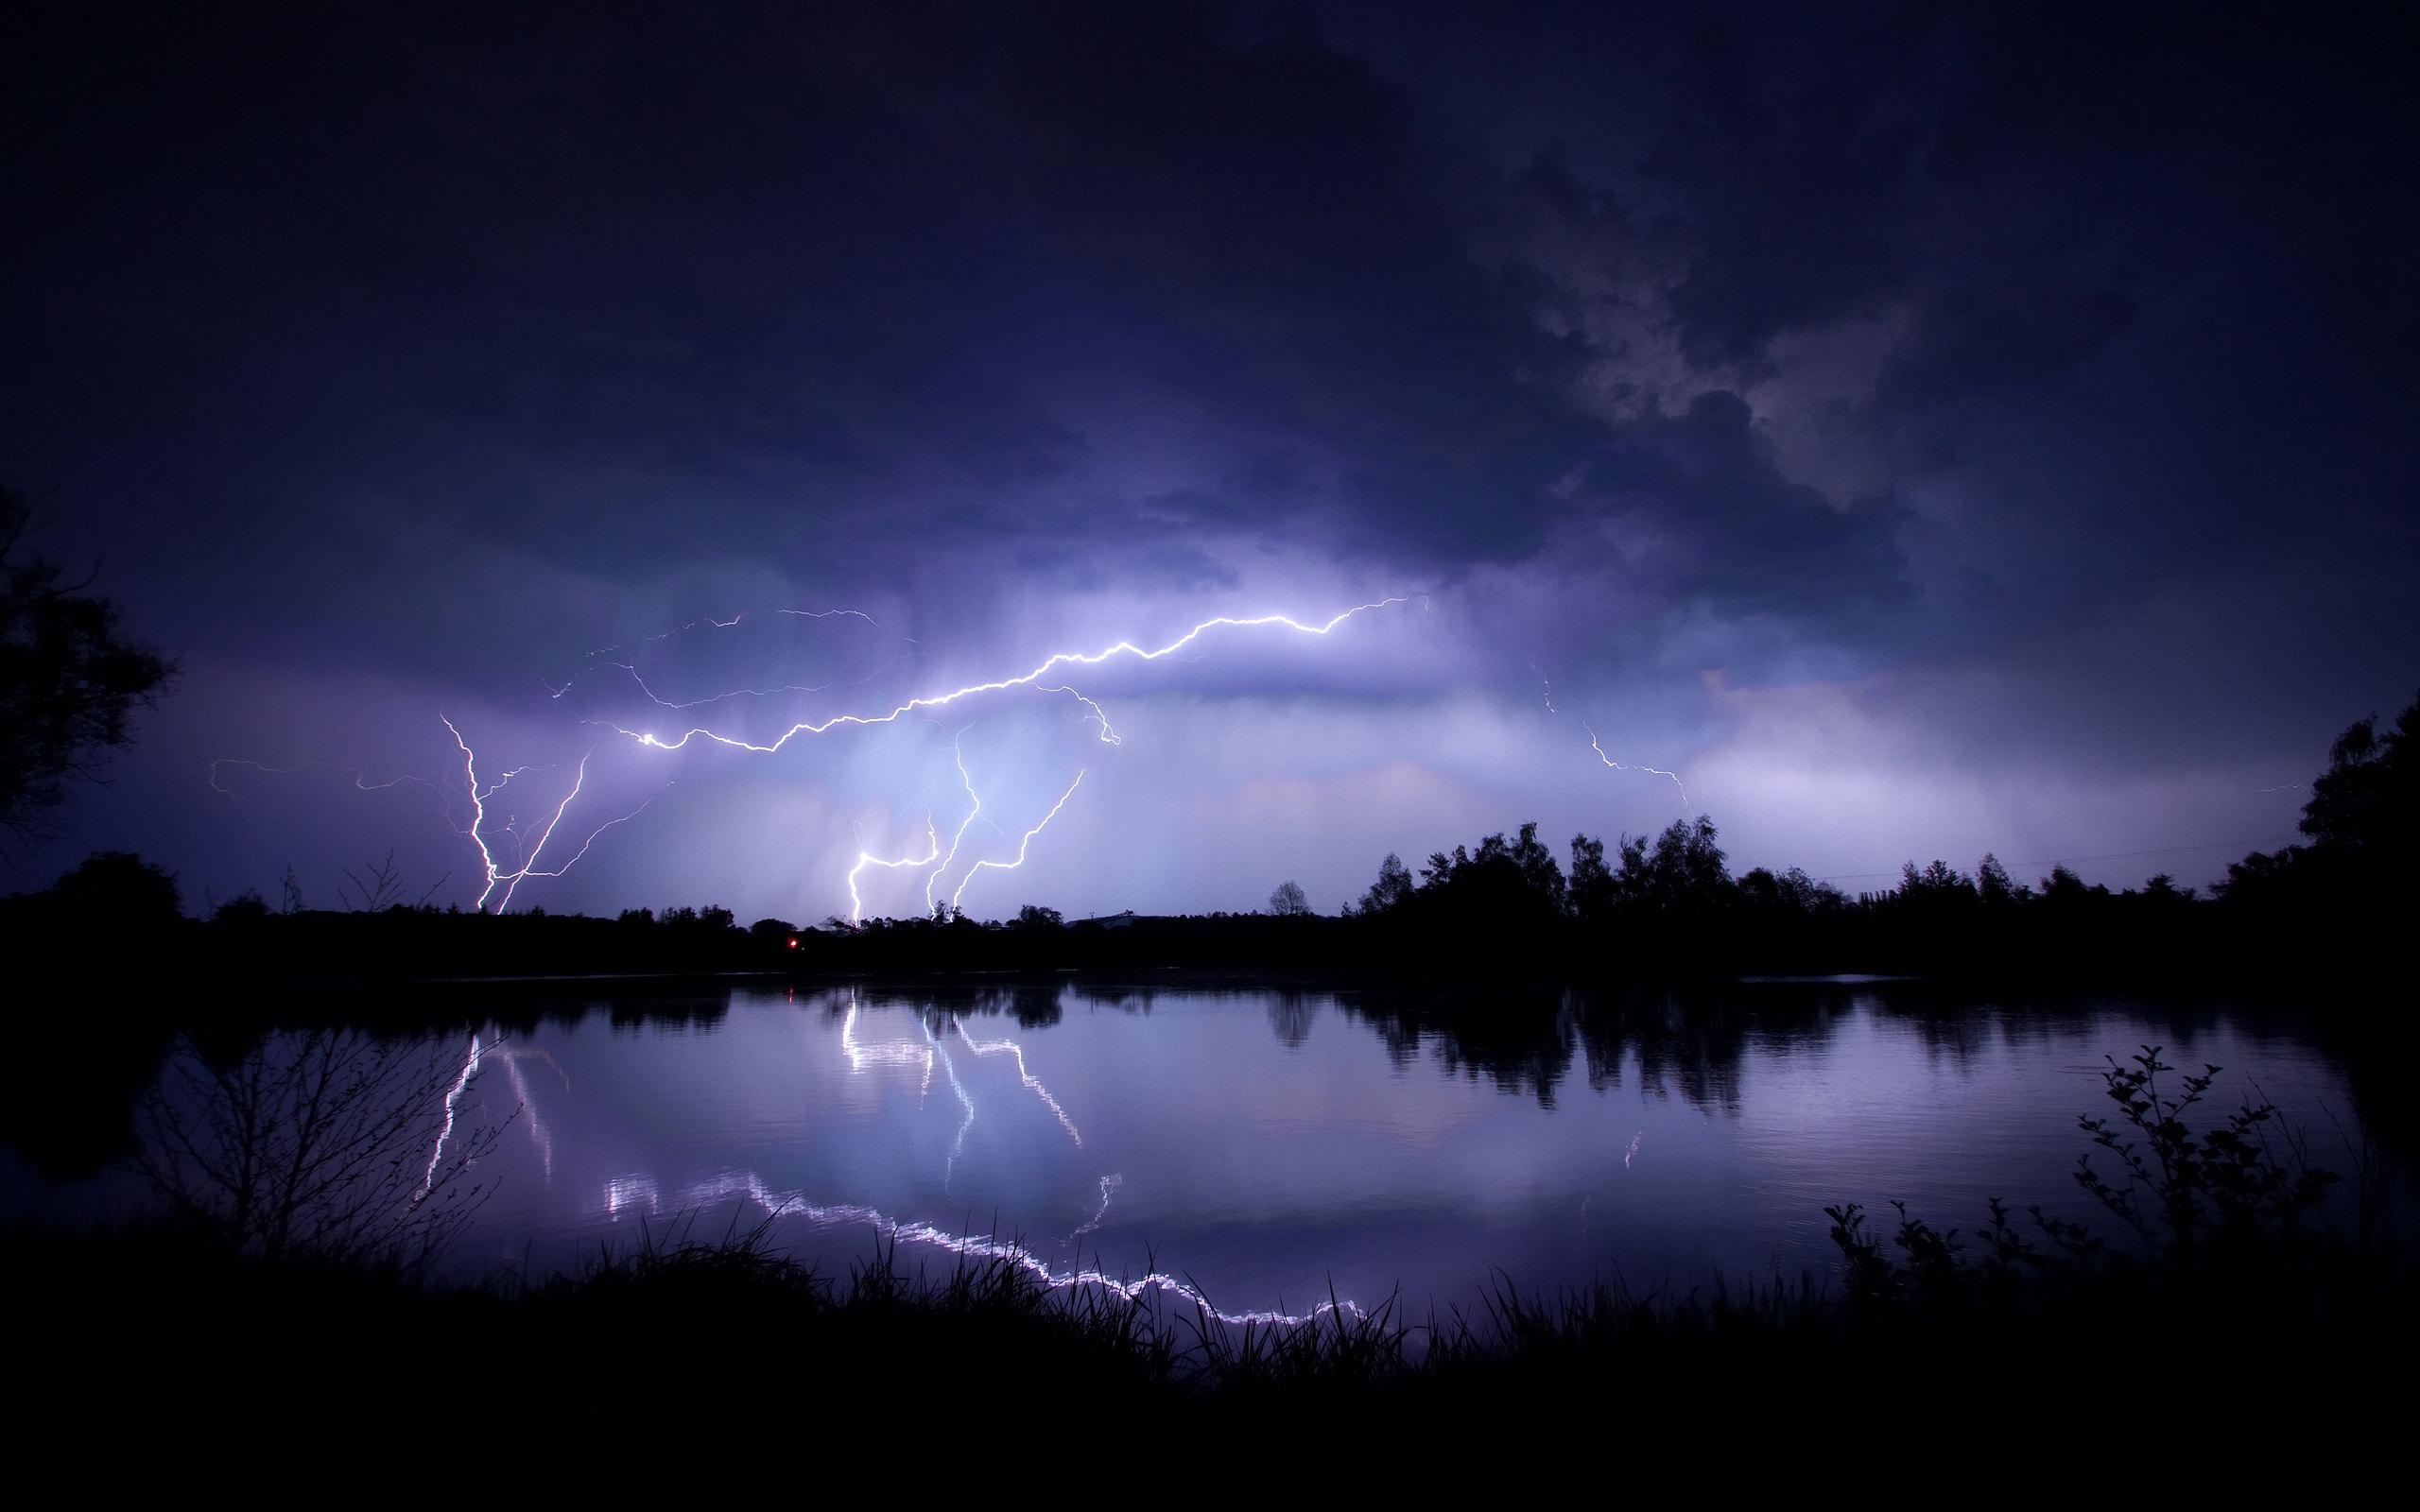 Animated Lightning Storm Wallpaper